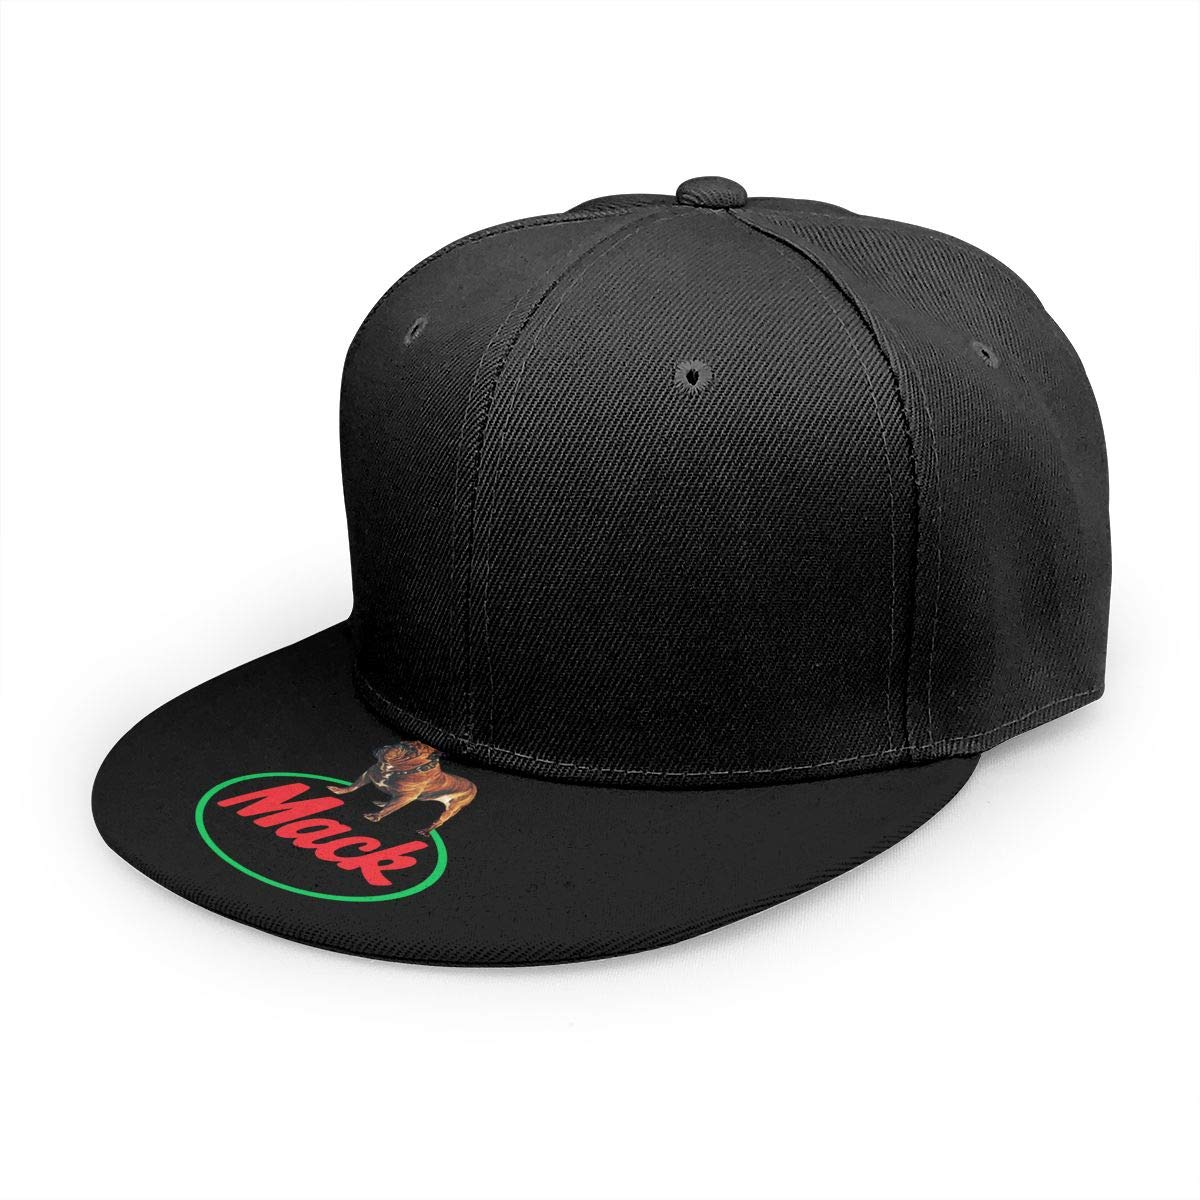 Adjustable Women Men Ma-ck Trucks Print Baseball Cap Flat Brim Cap Hats Hip Hop Snapback Sun Hat Boys Girls Black by Apolonia